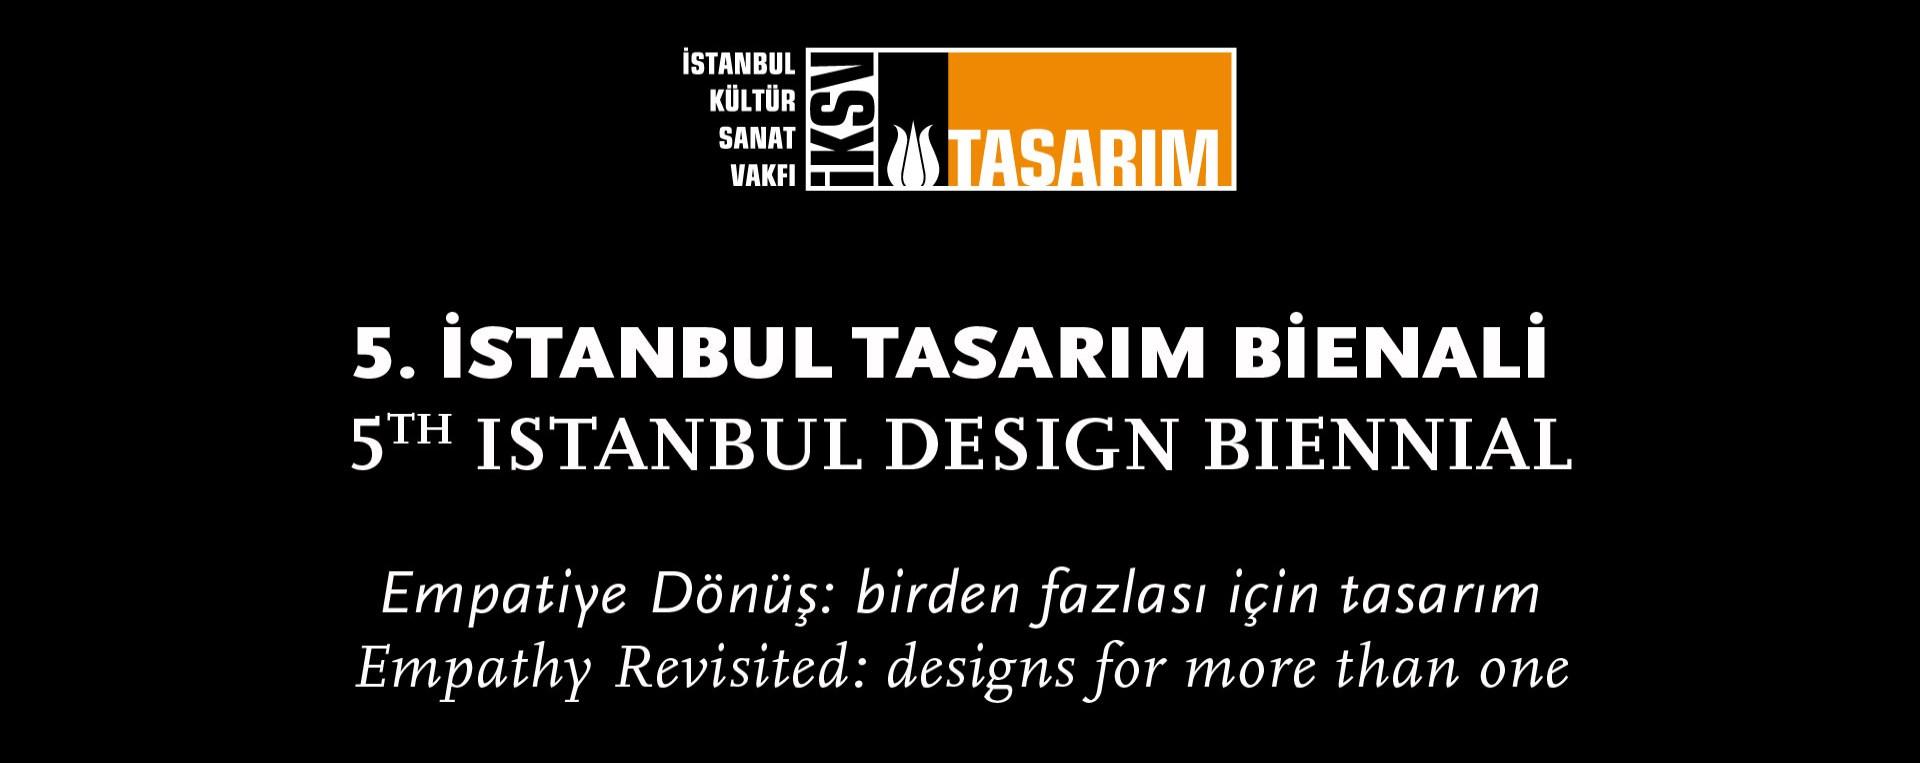 5. İSTANBUL TASARIM BİENALİ